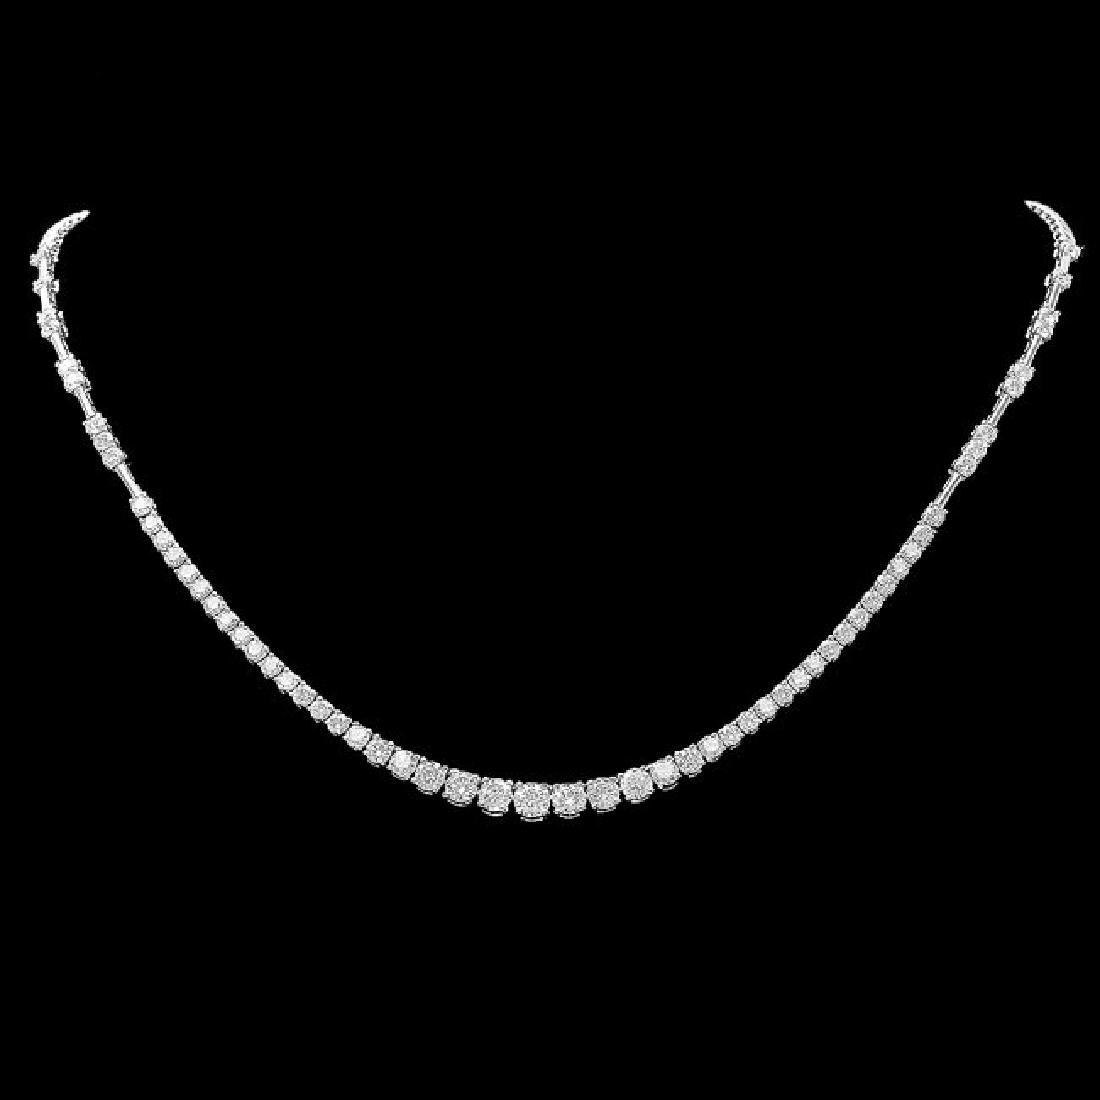 18k White Gold 5.80ct Diamond Necklace